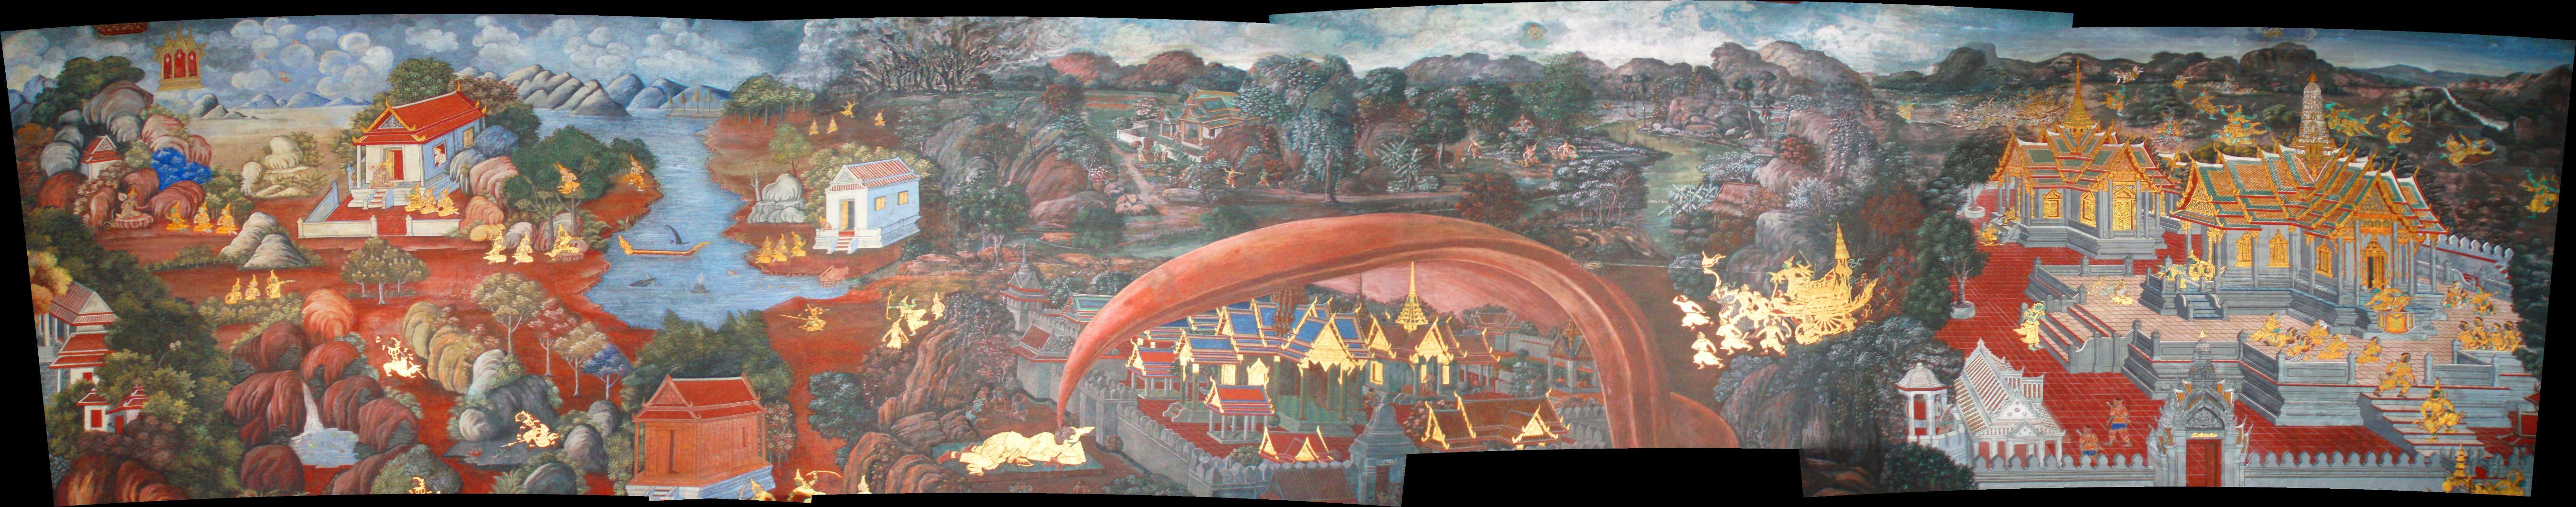 Wandmalerei im Königspalast in Bangkok